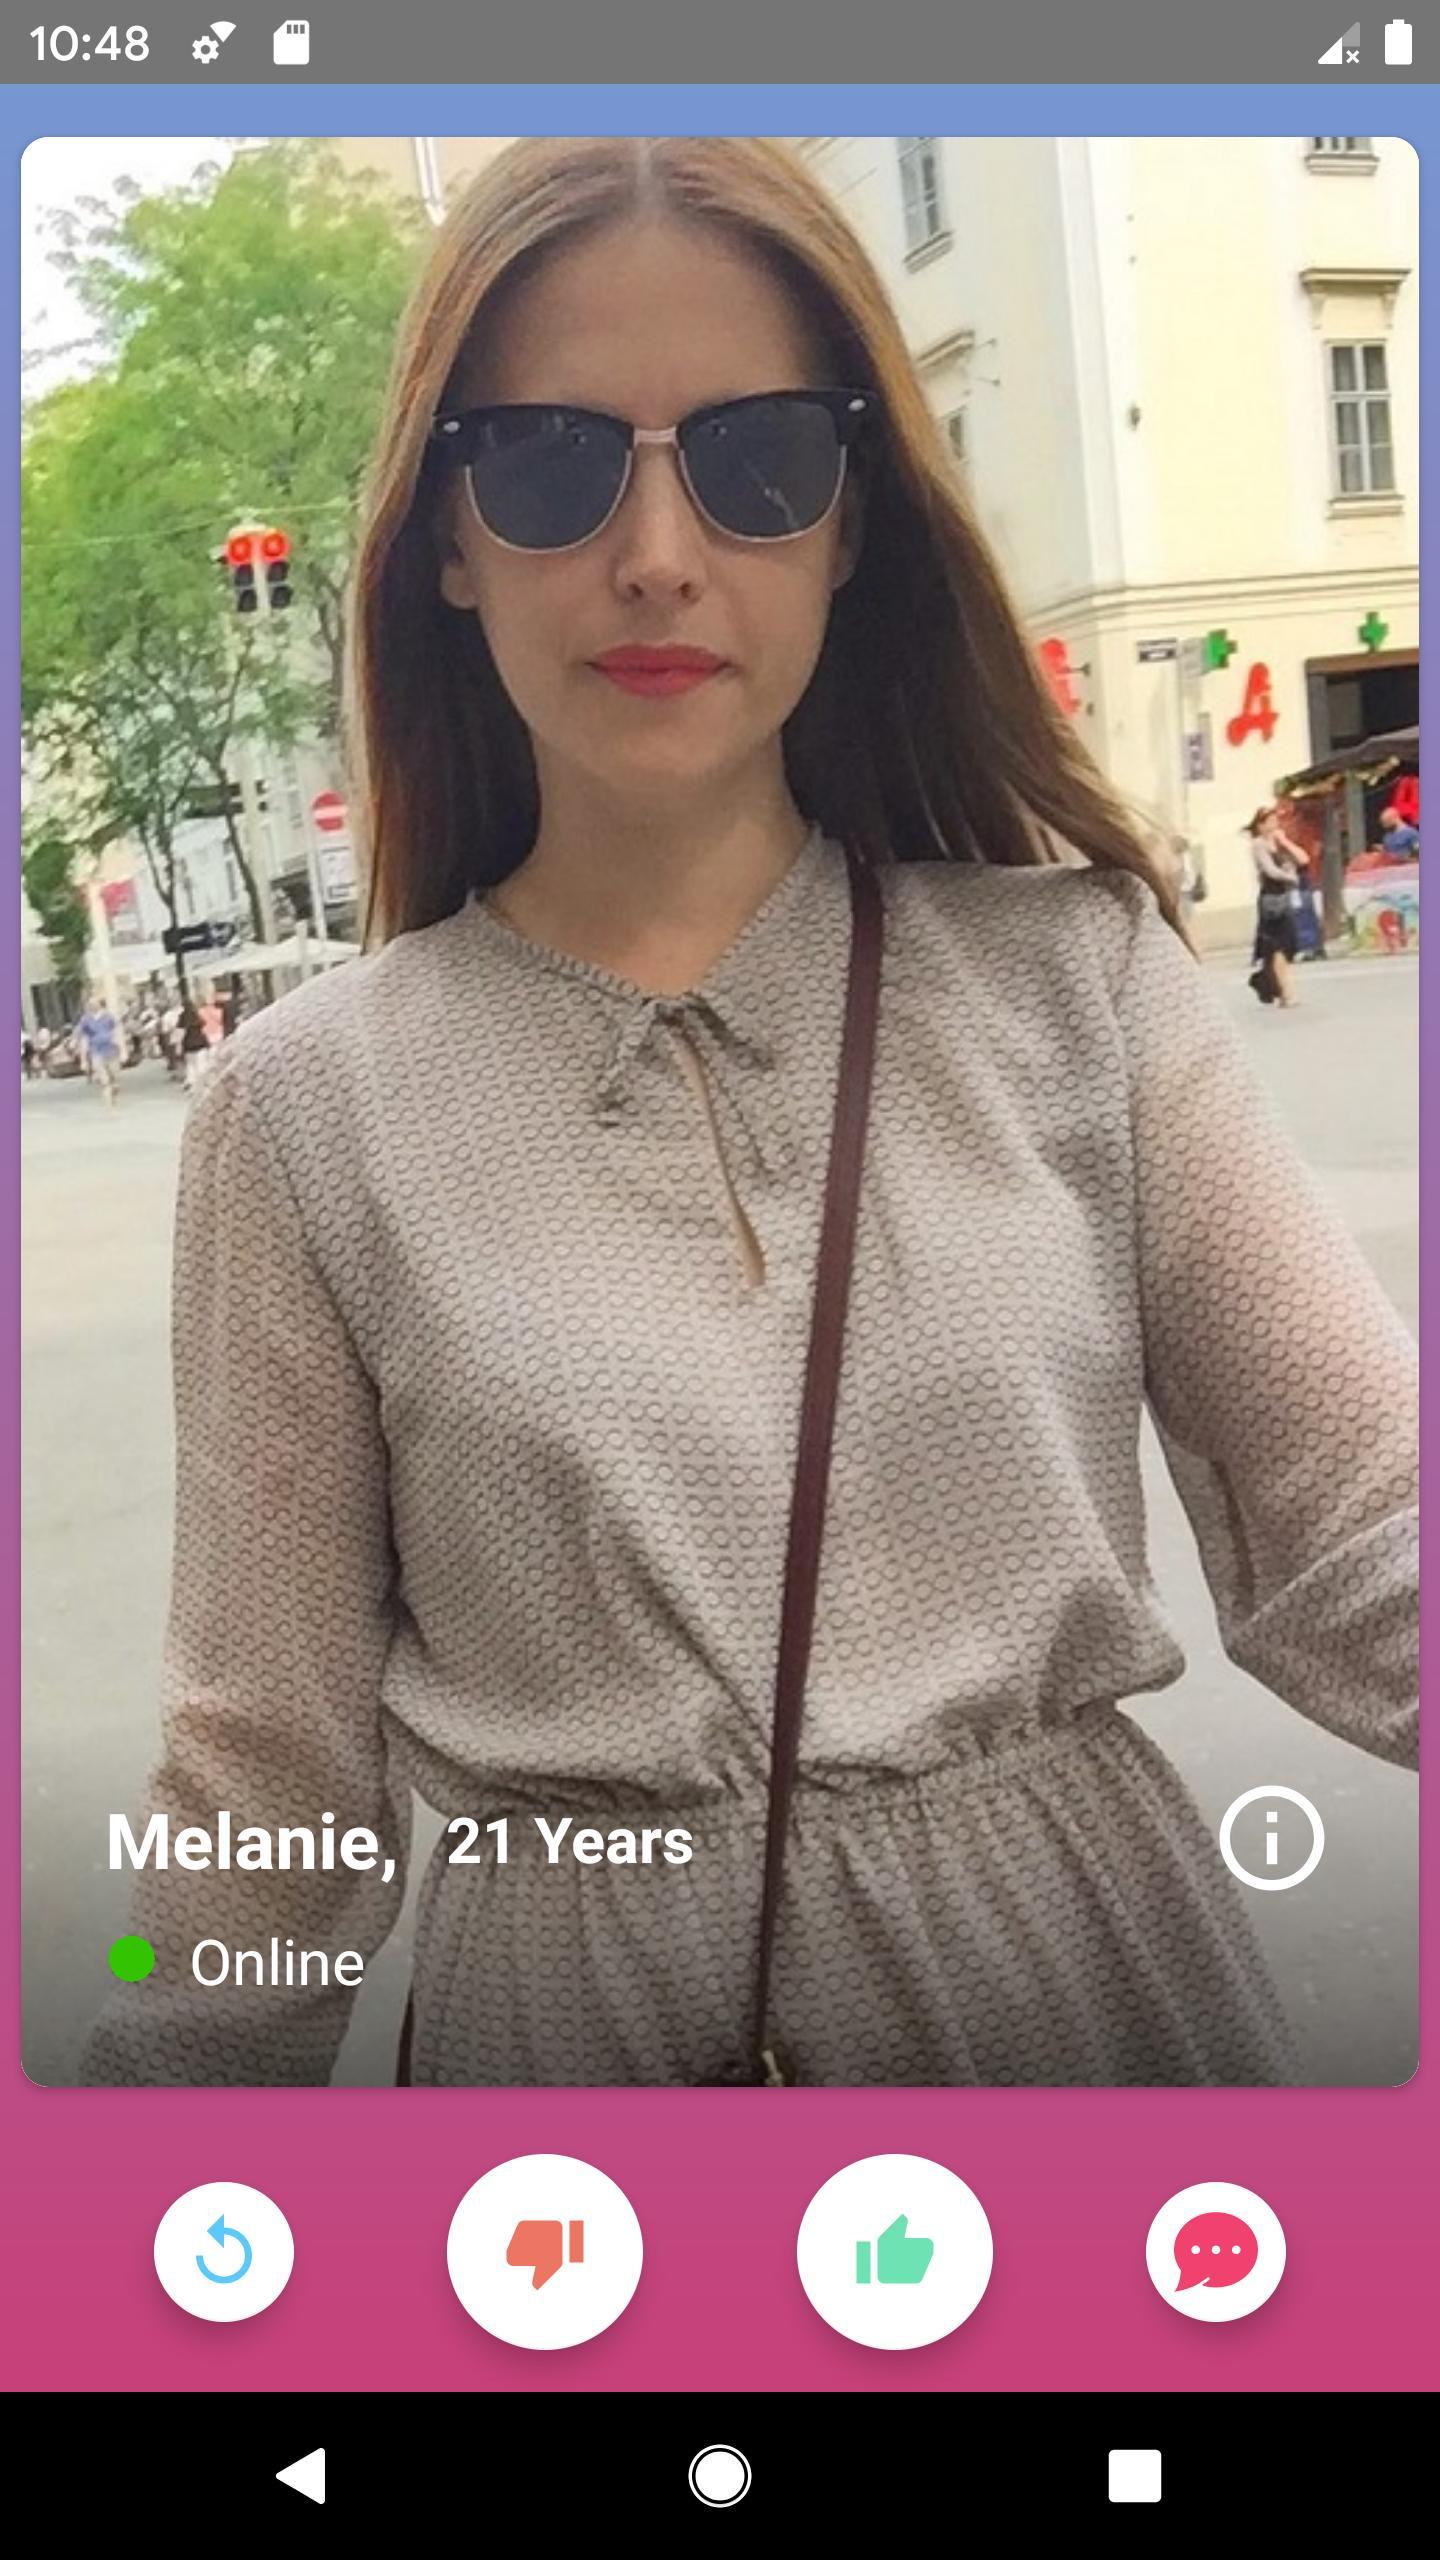 nopeus dating images